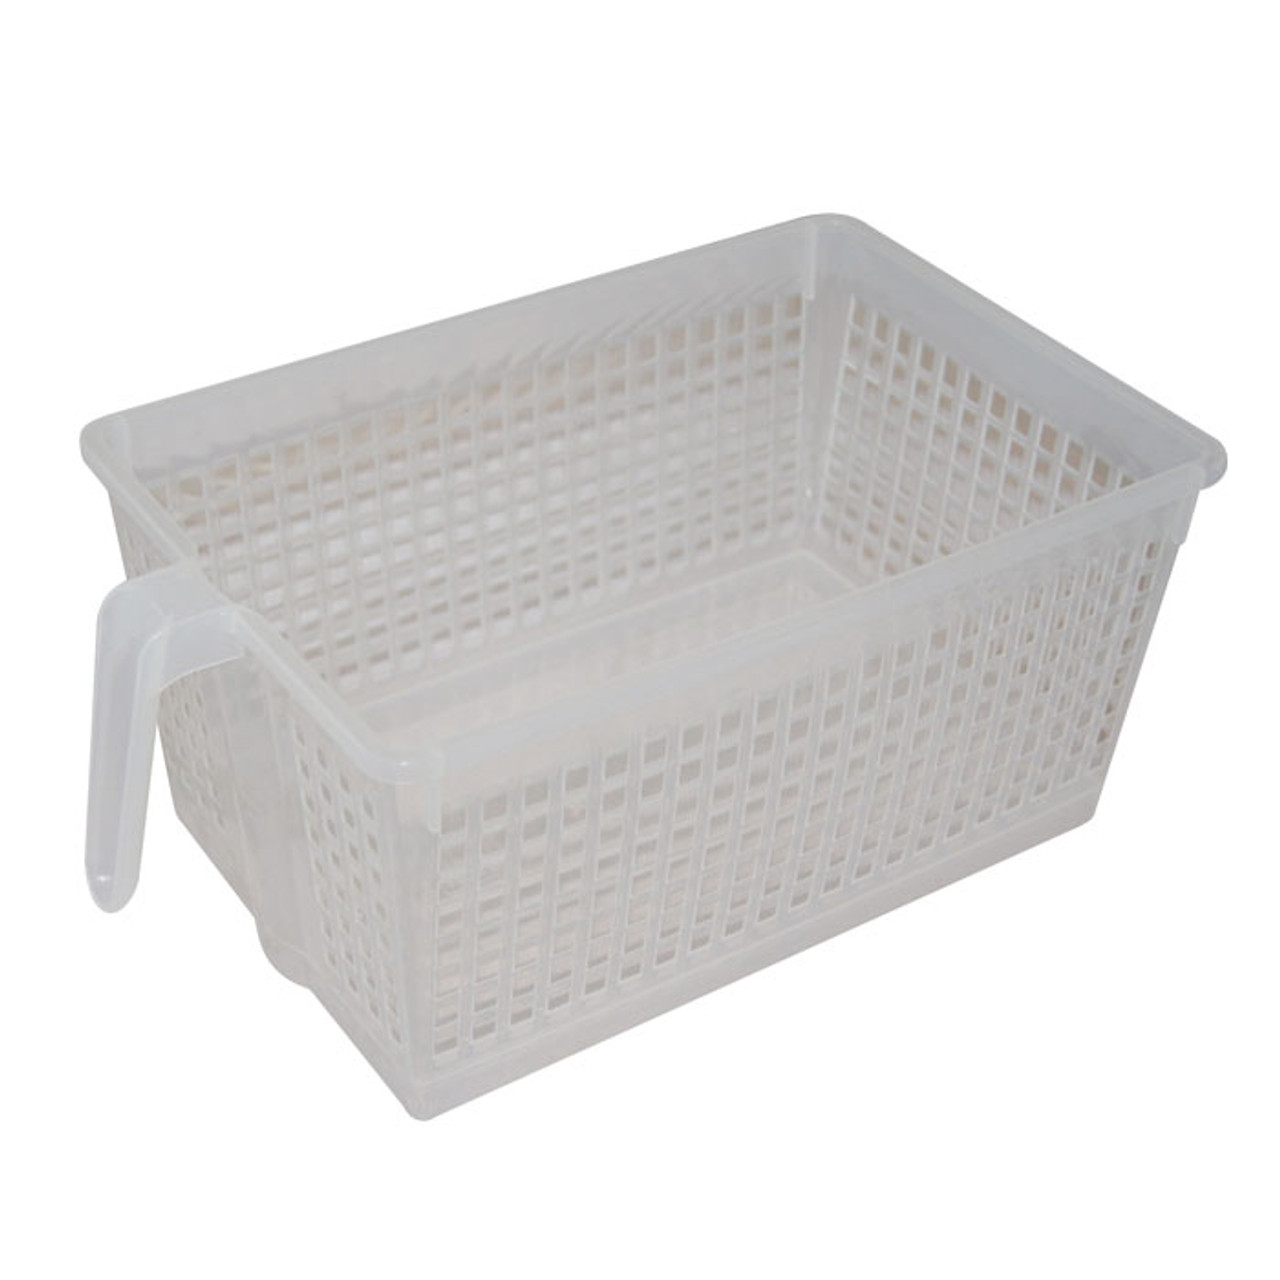 Clear Handled Storage Basket, Large.